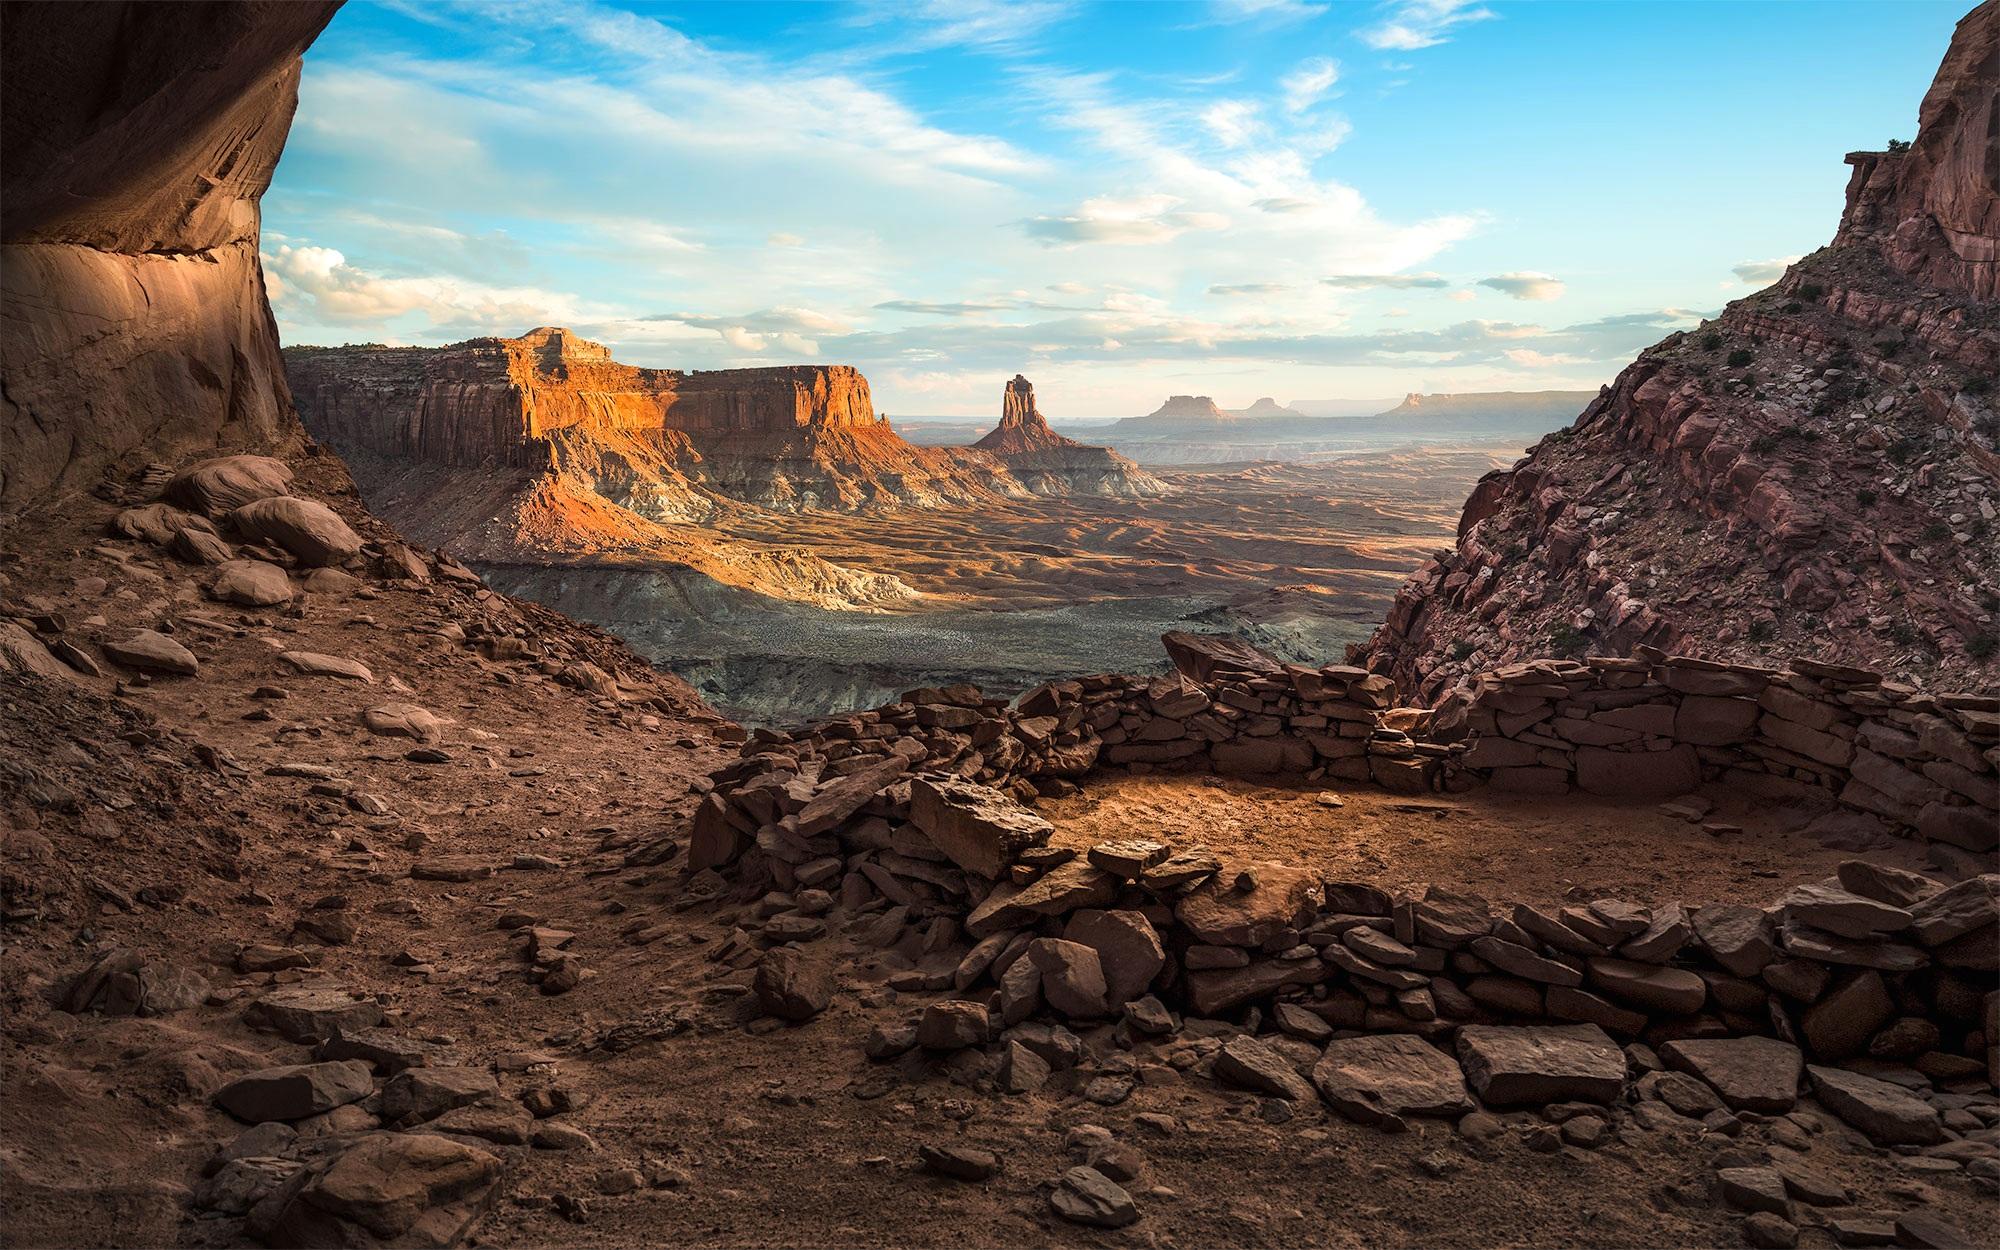 The False Kiva - Canyonlands National Park, UT